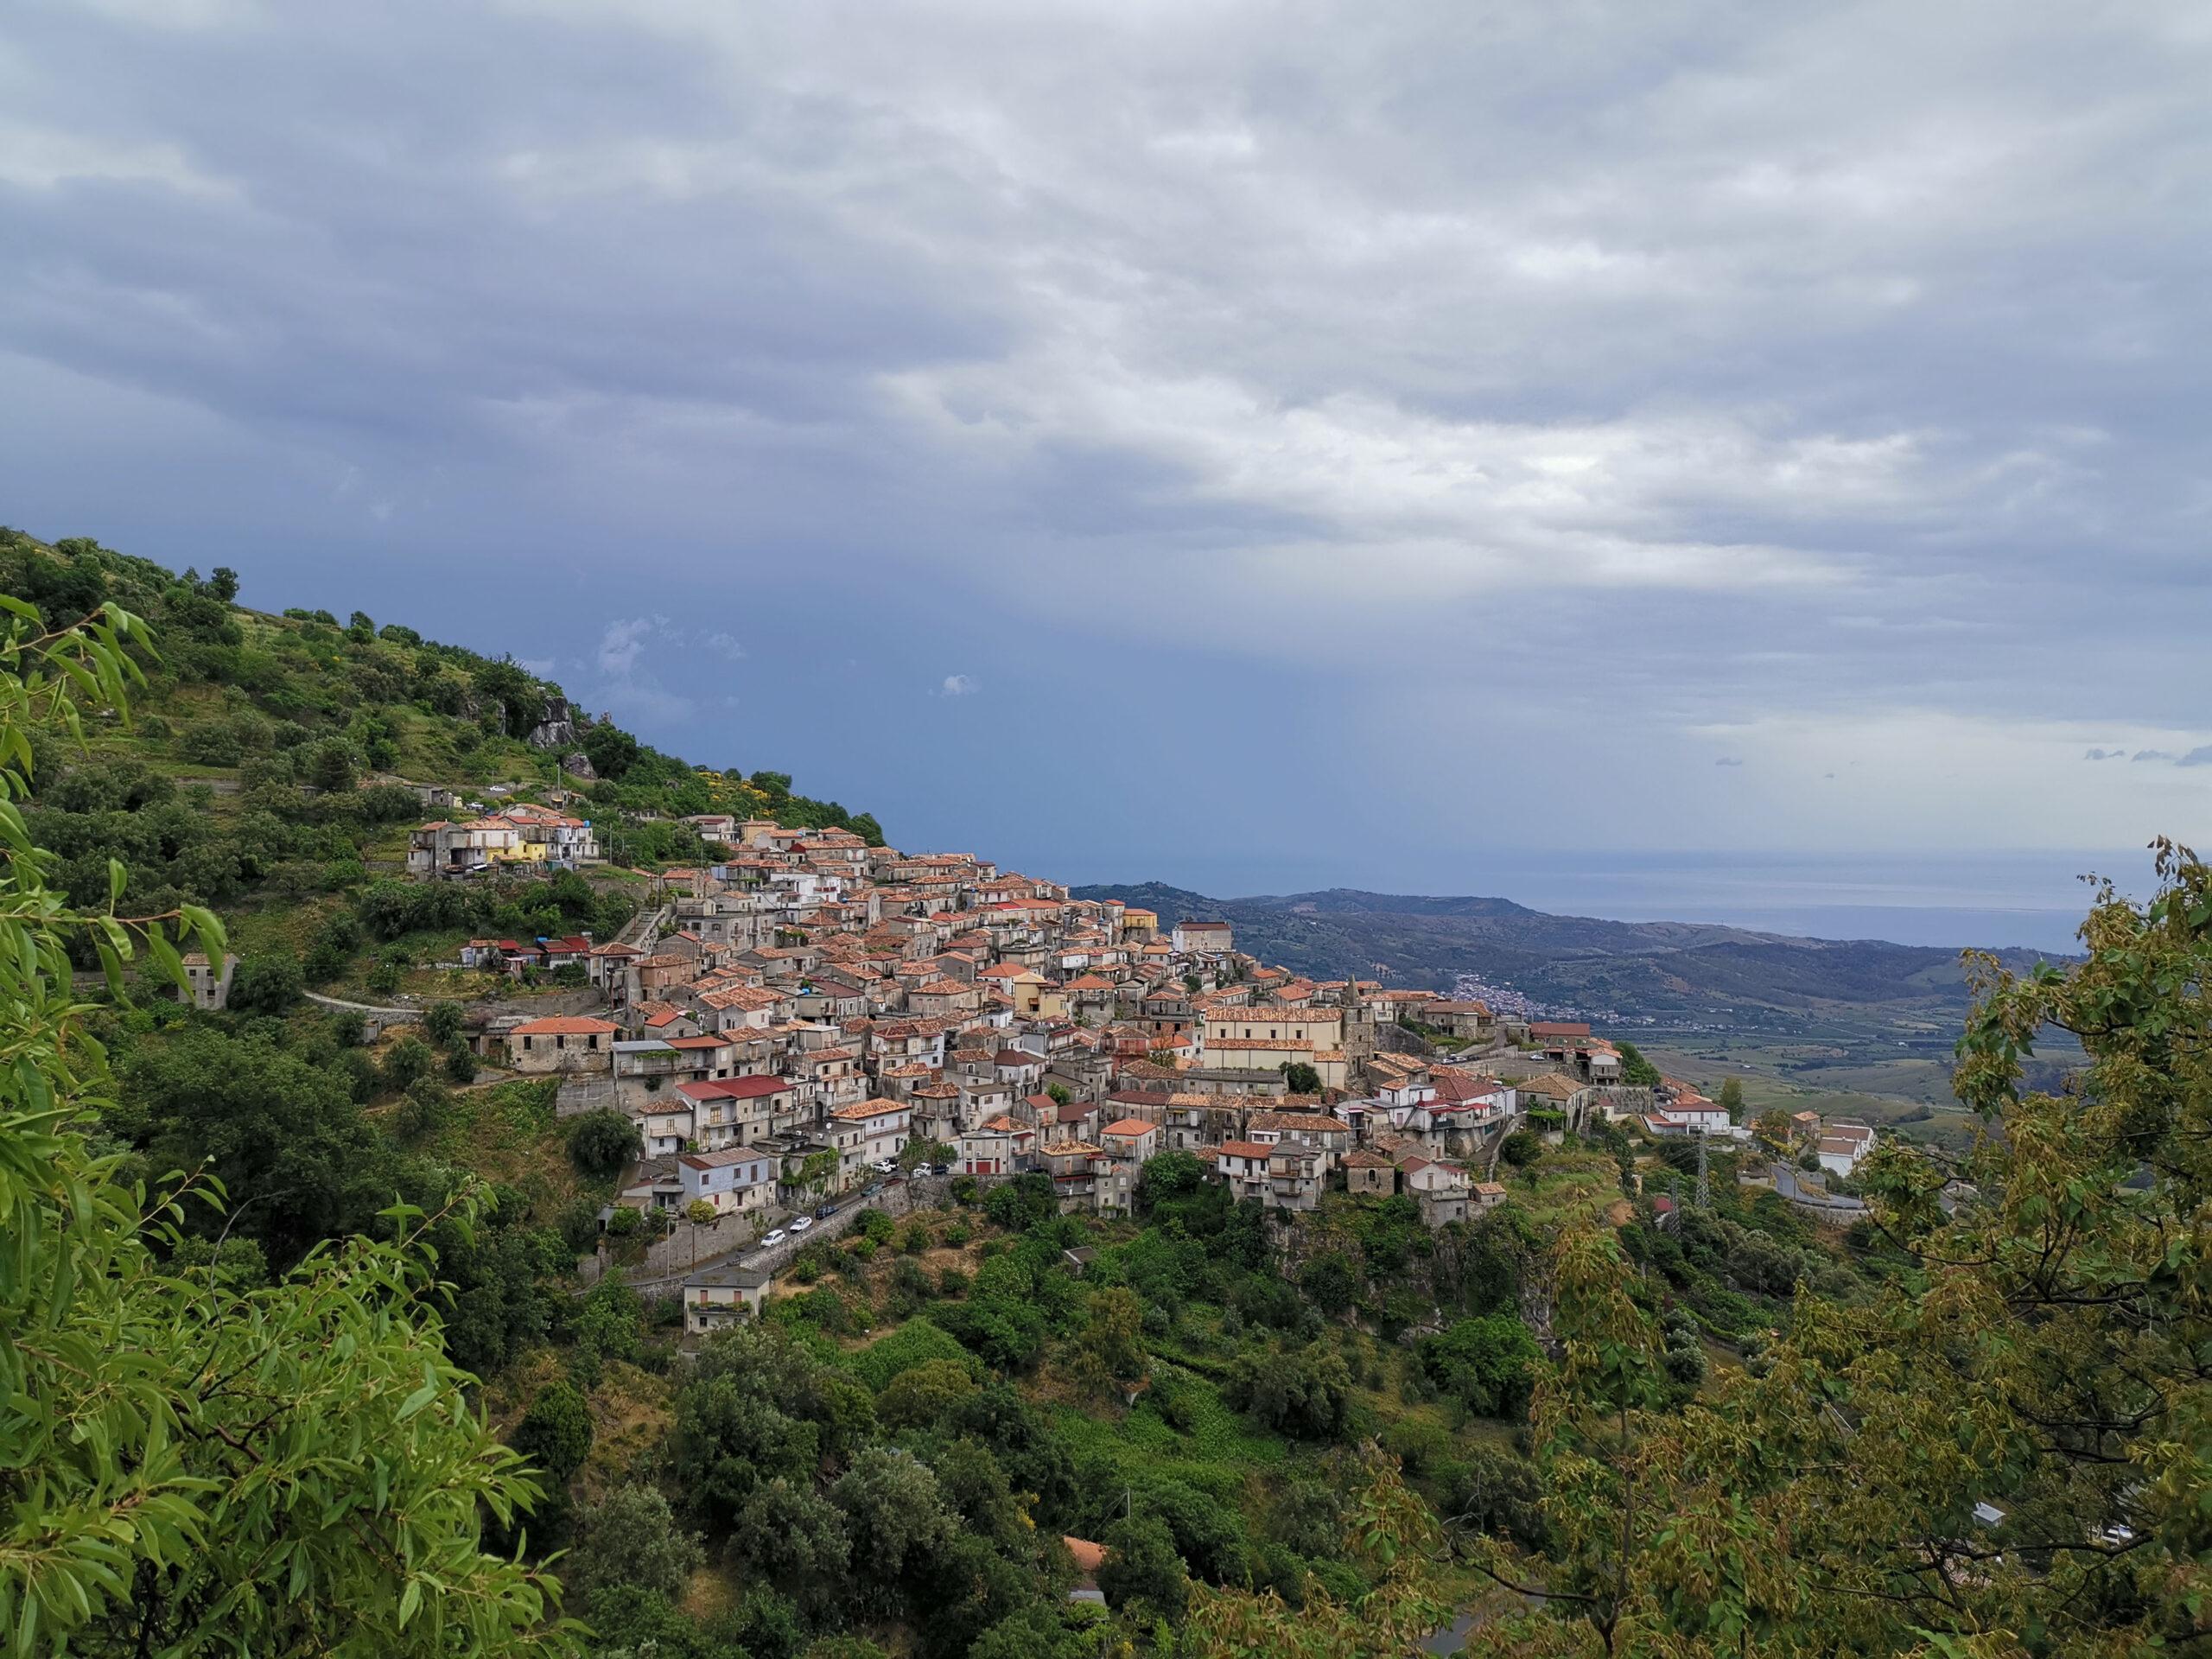 Veduta sul borgo di Staiti